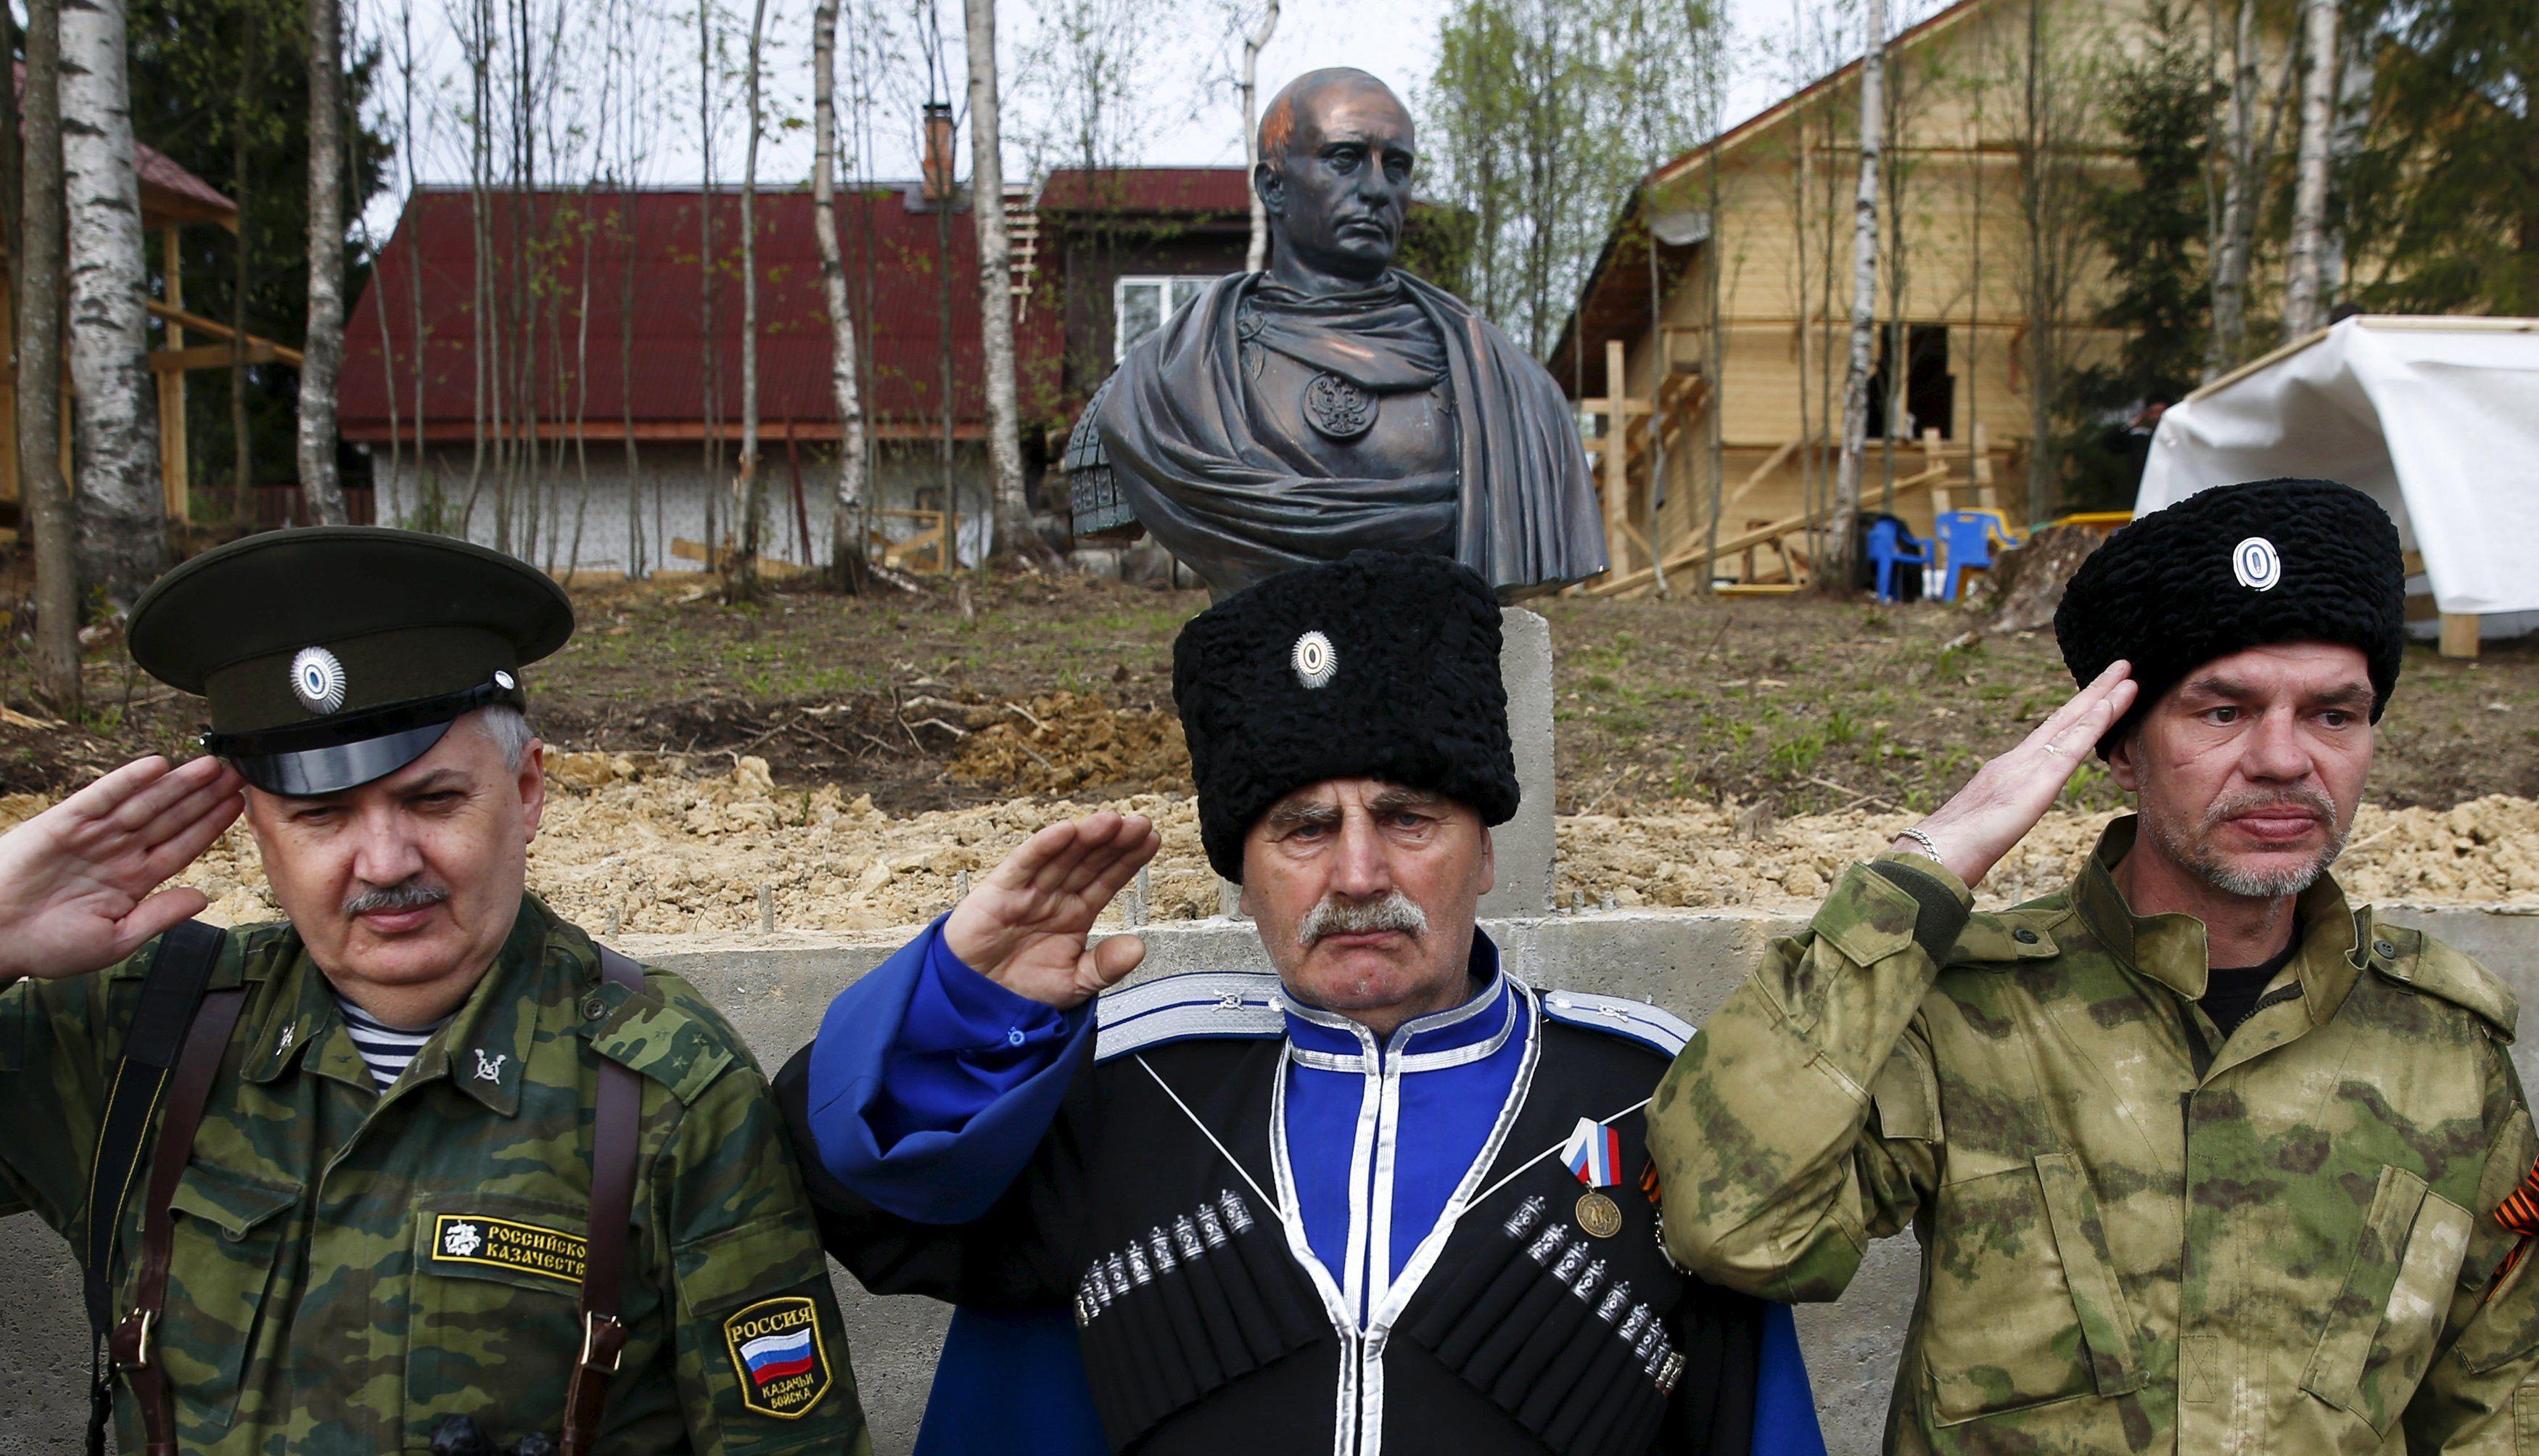 Бюст Путина в Ленинградской области